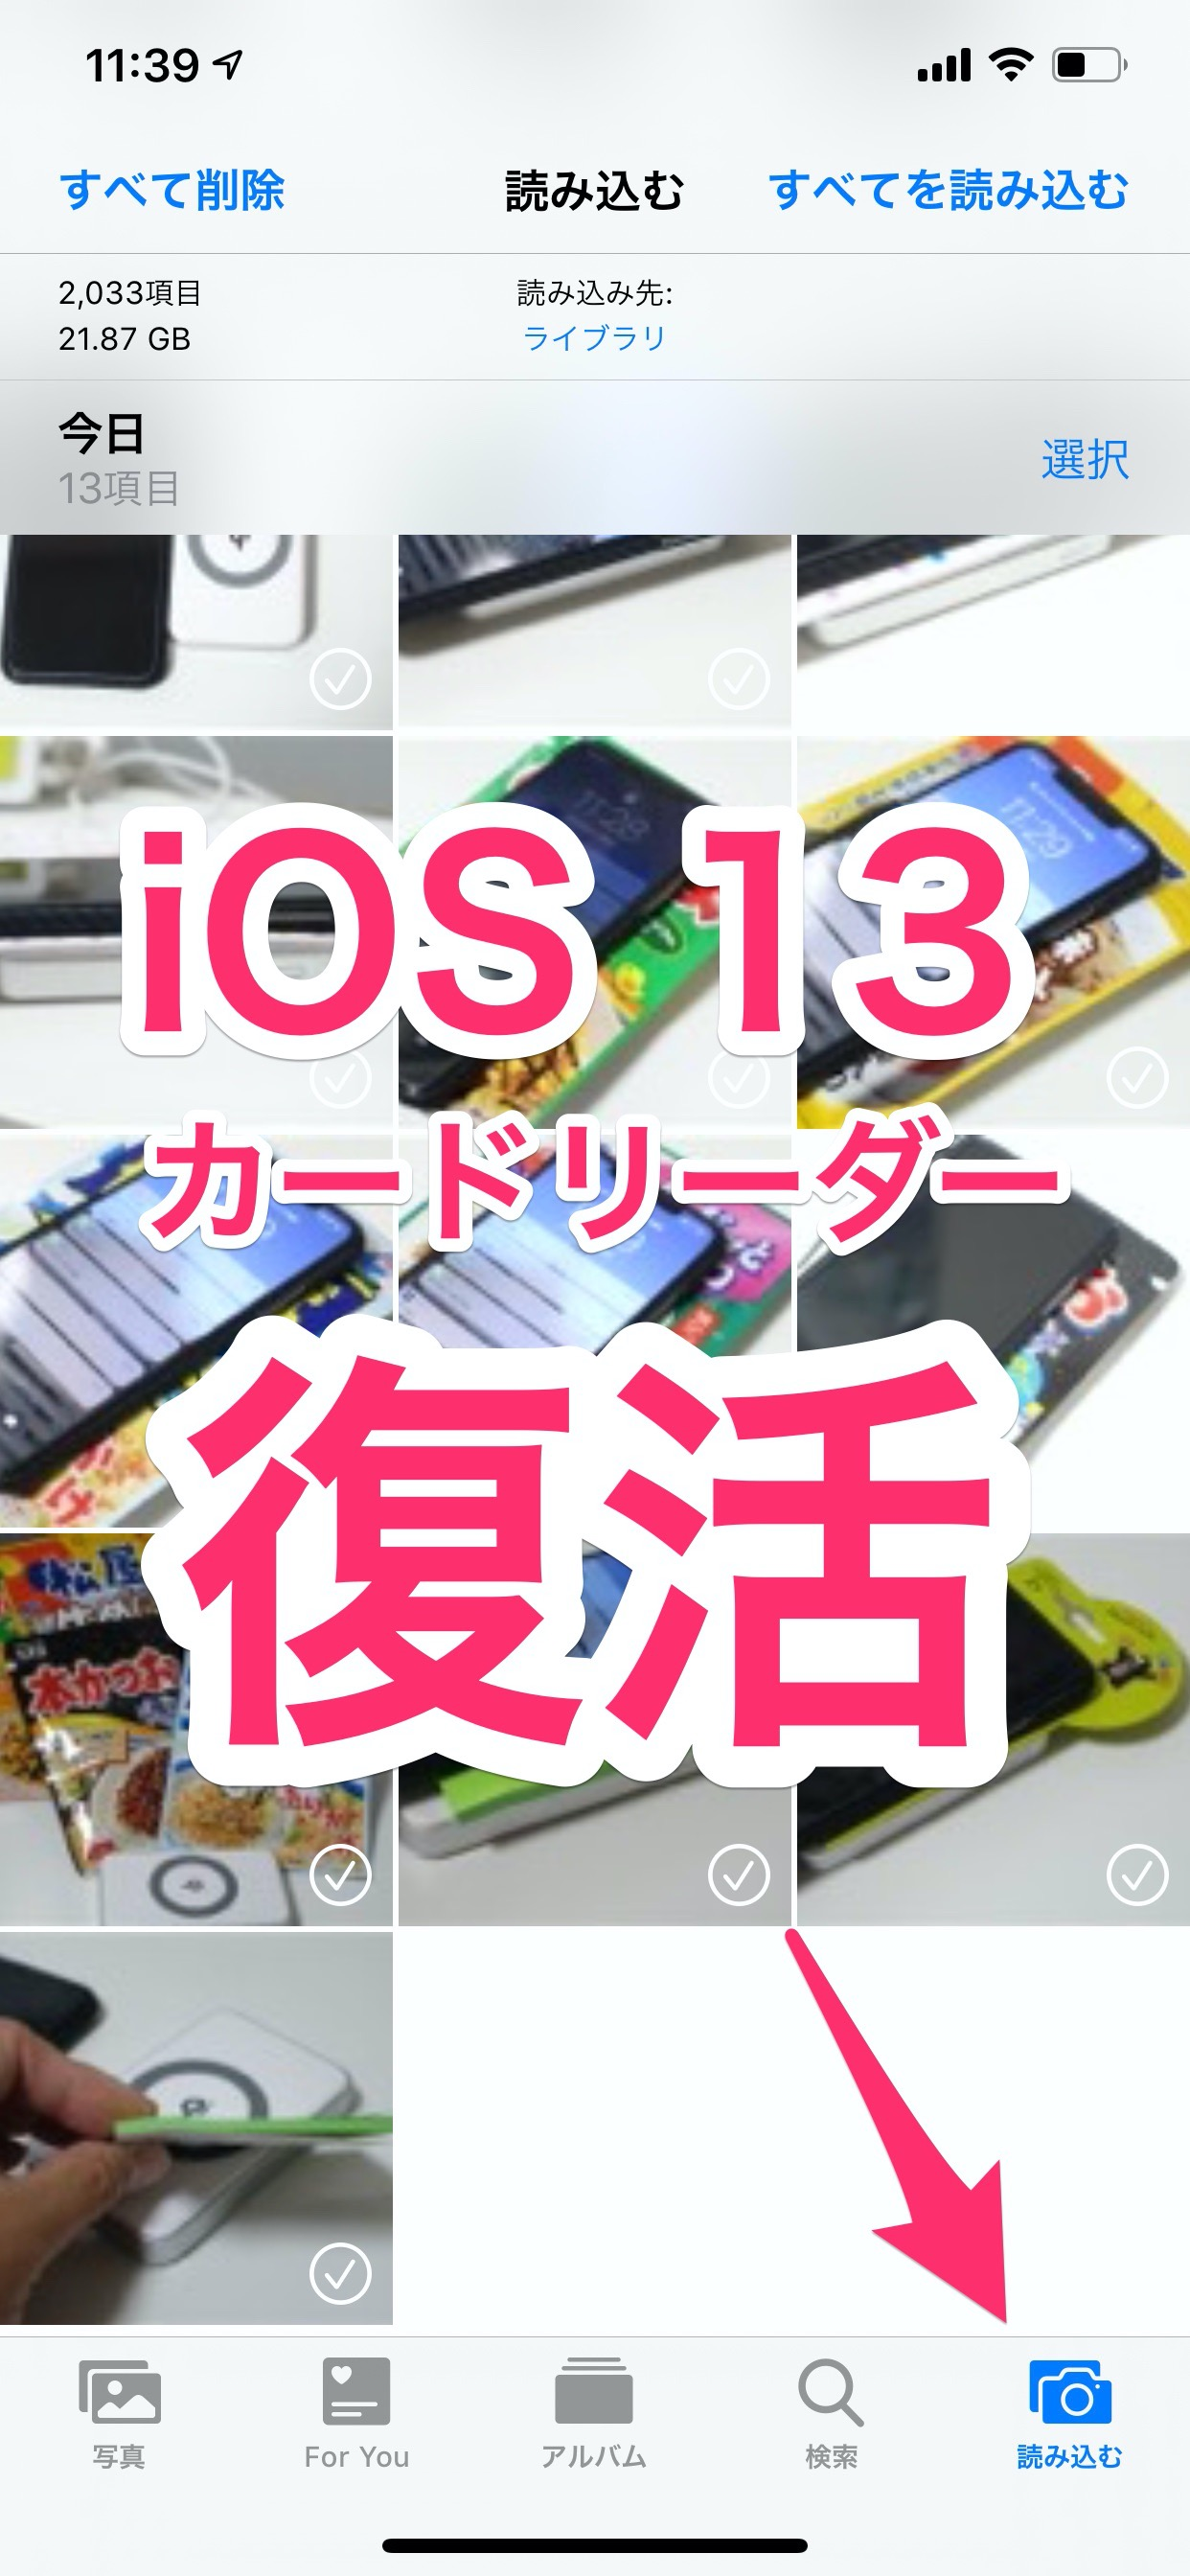 【iOS 13】SDカードリーダーで写真の読み込みが復活